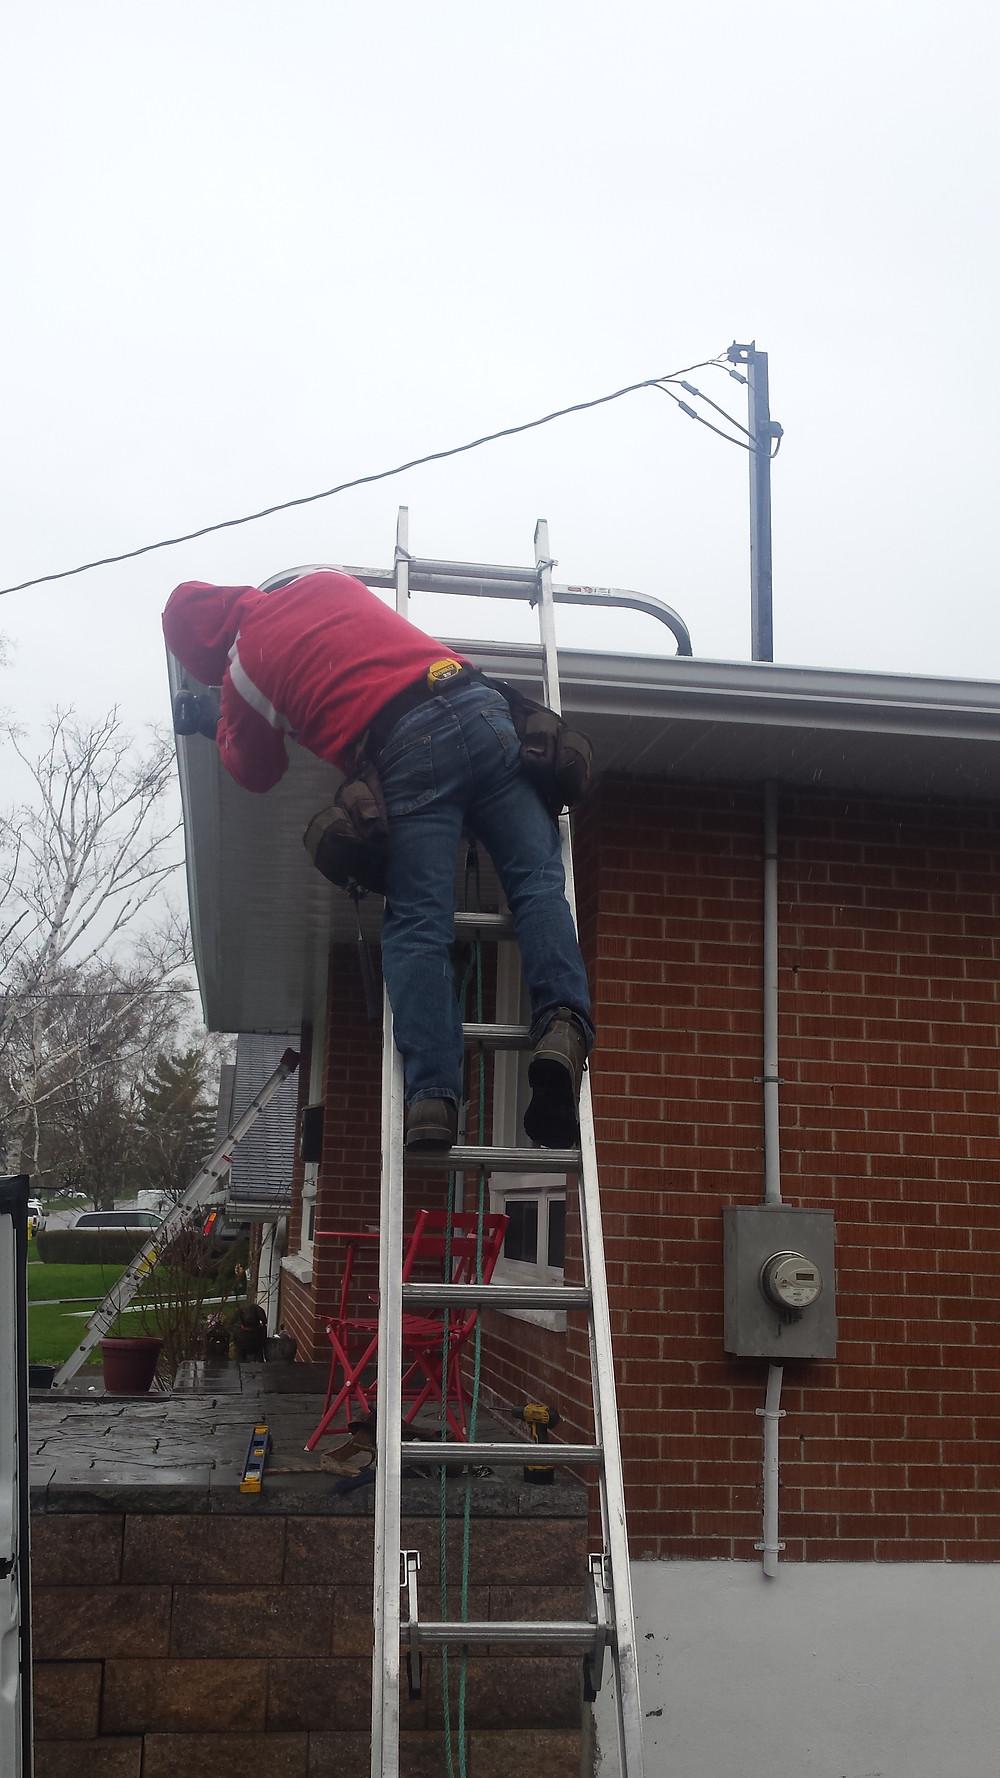 Eavestrough repair leafguard installation